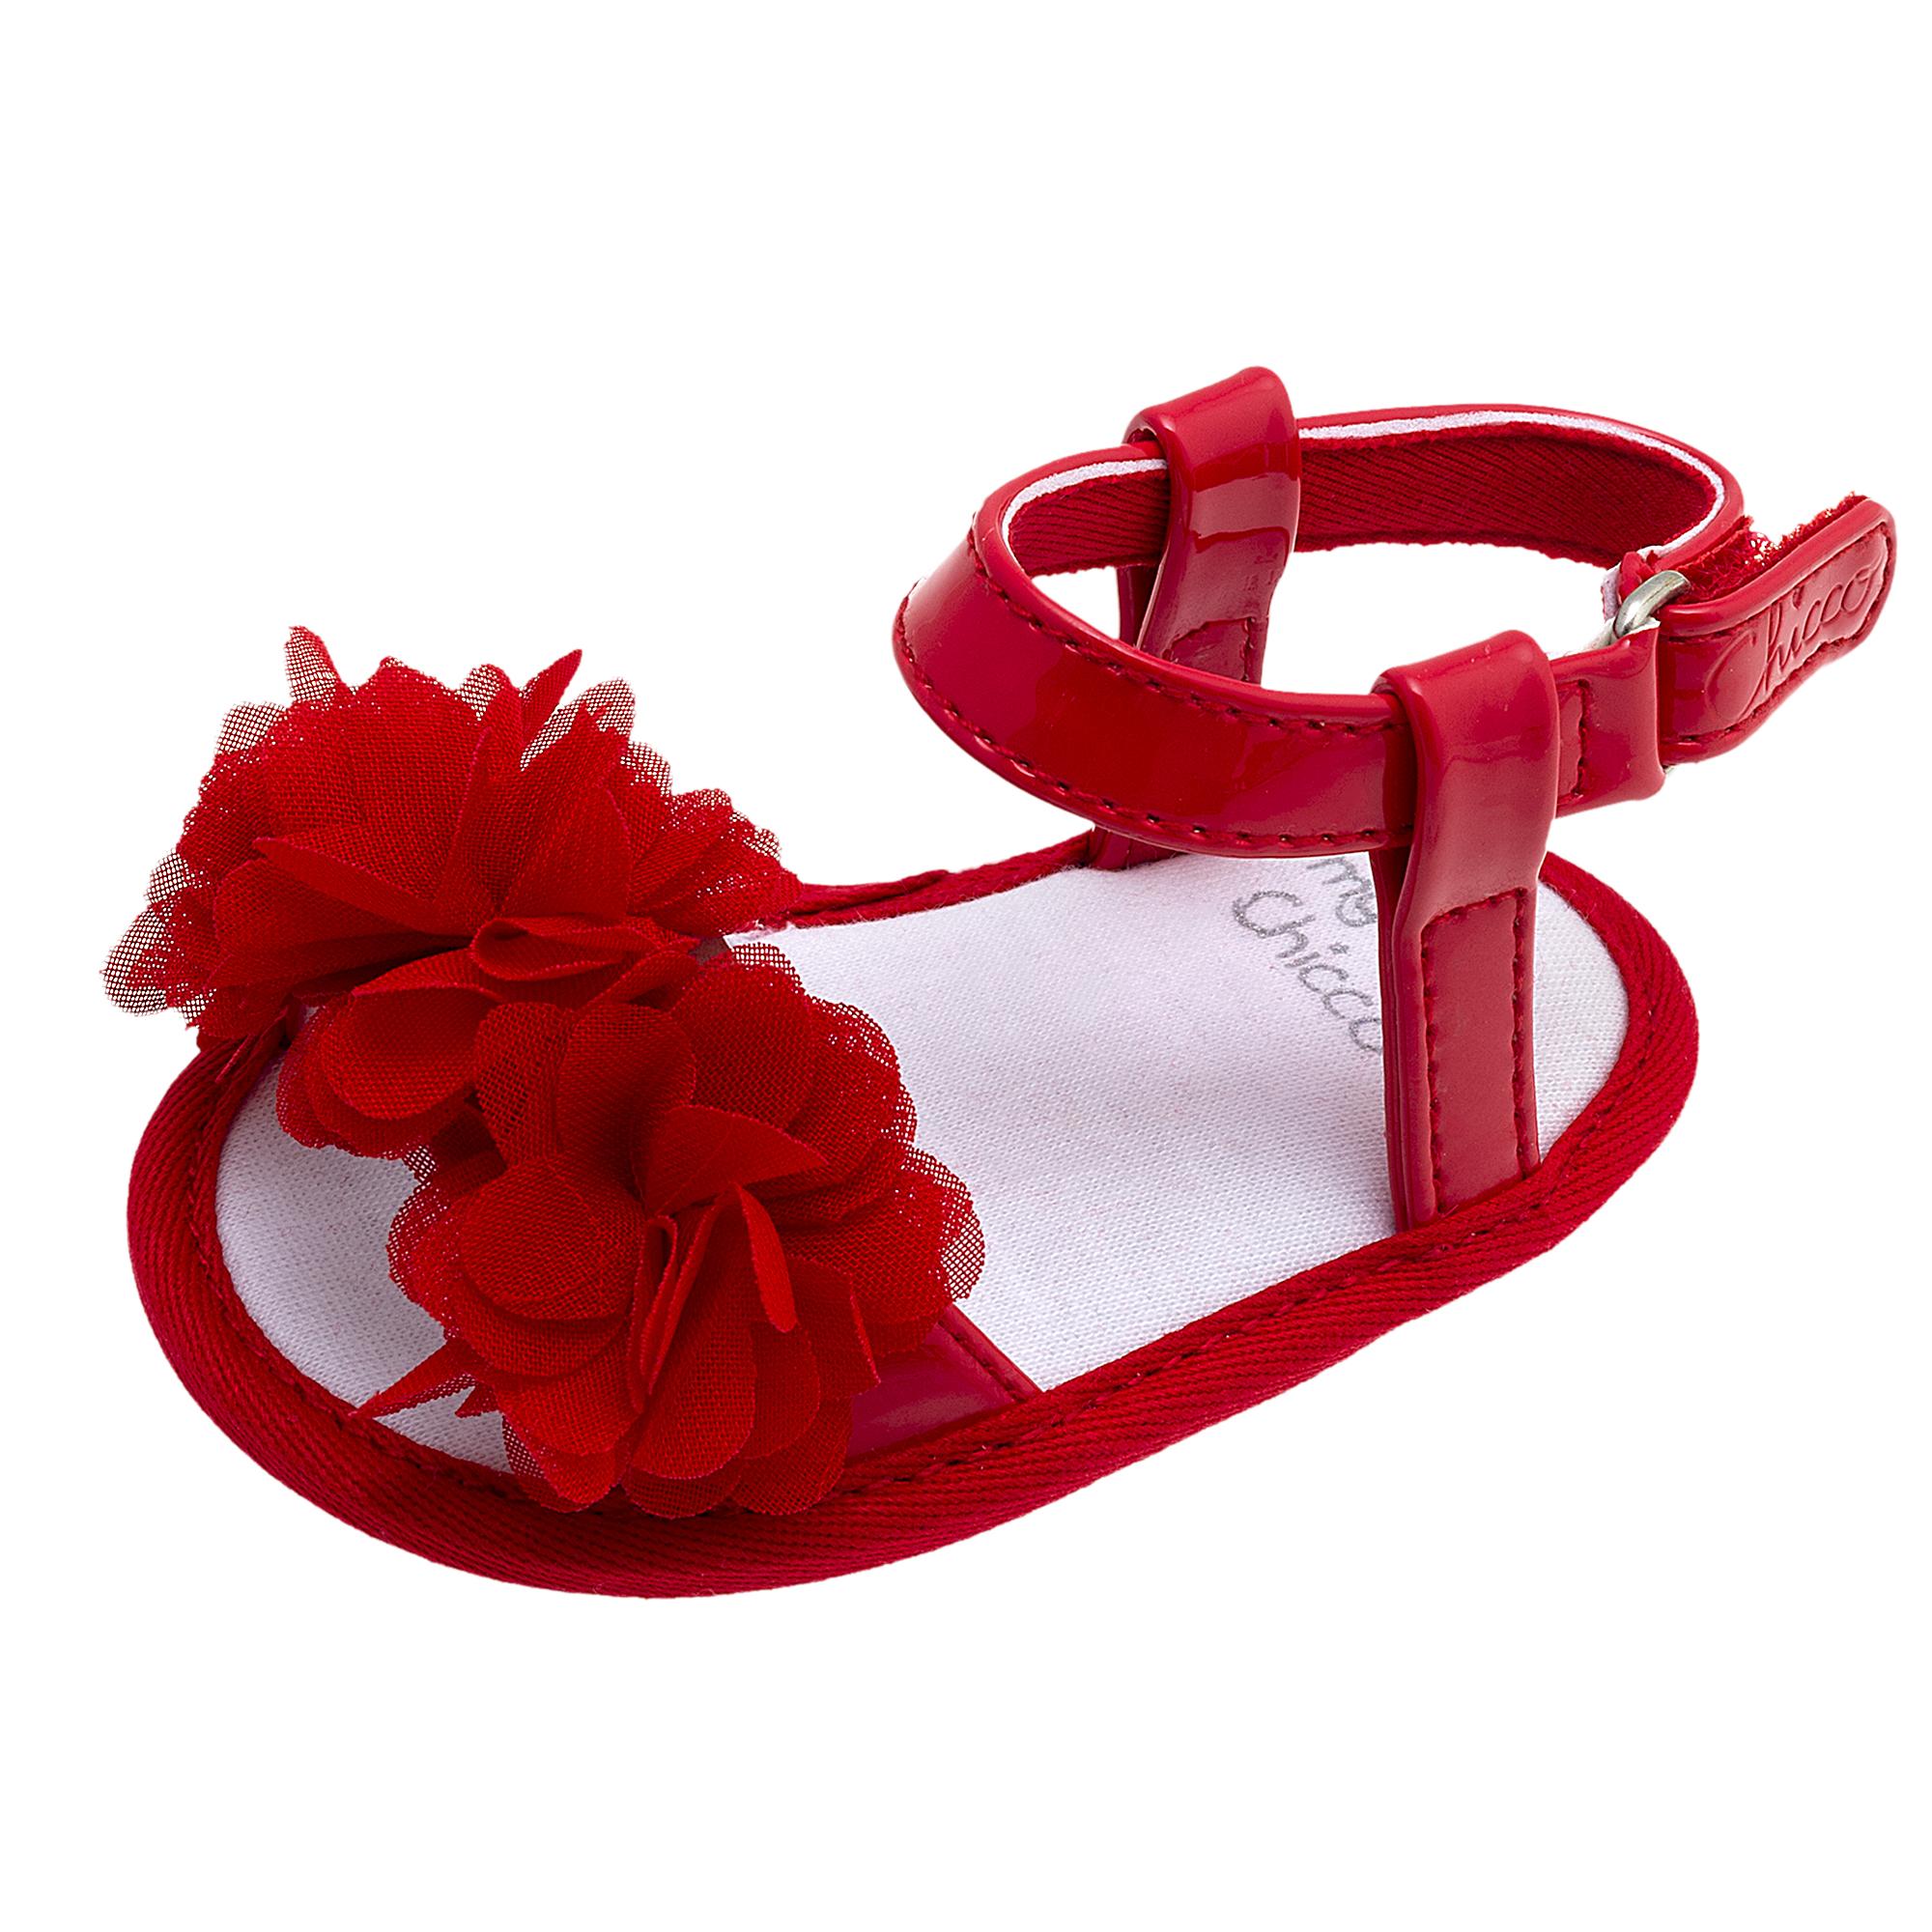 Sandale Copii Chicco Osiria, Rosu, 63112 imagine